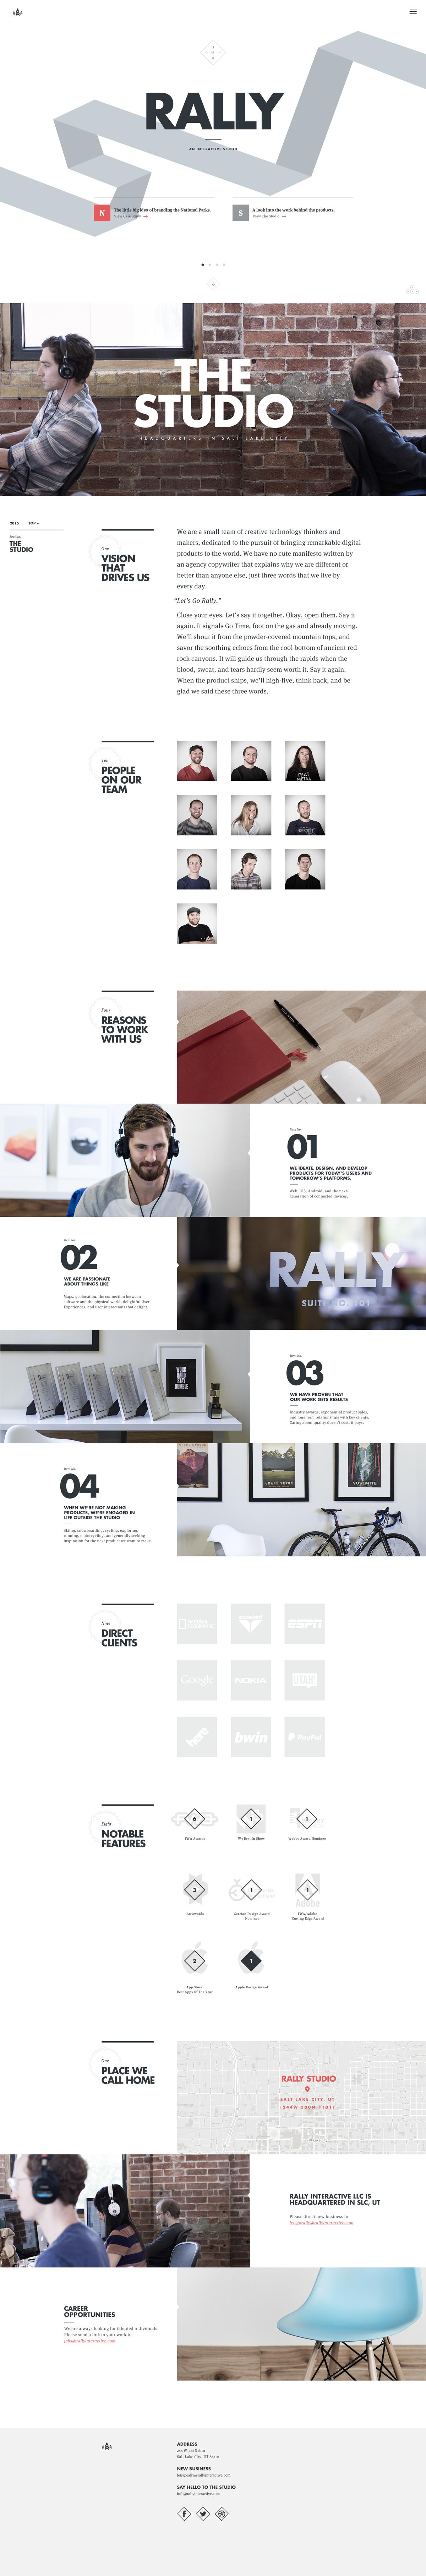 001 Png By Ben Mingo Web Design Inspiration Web Layout Design Web Design